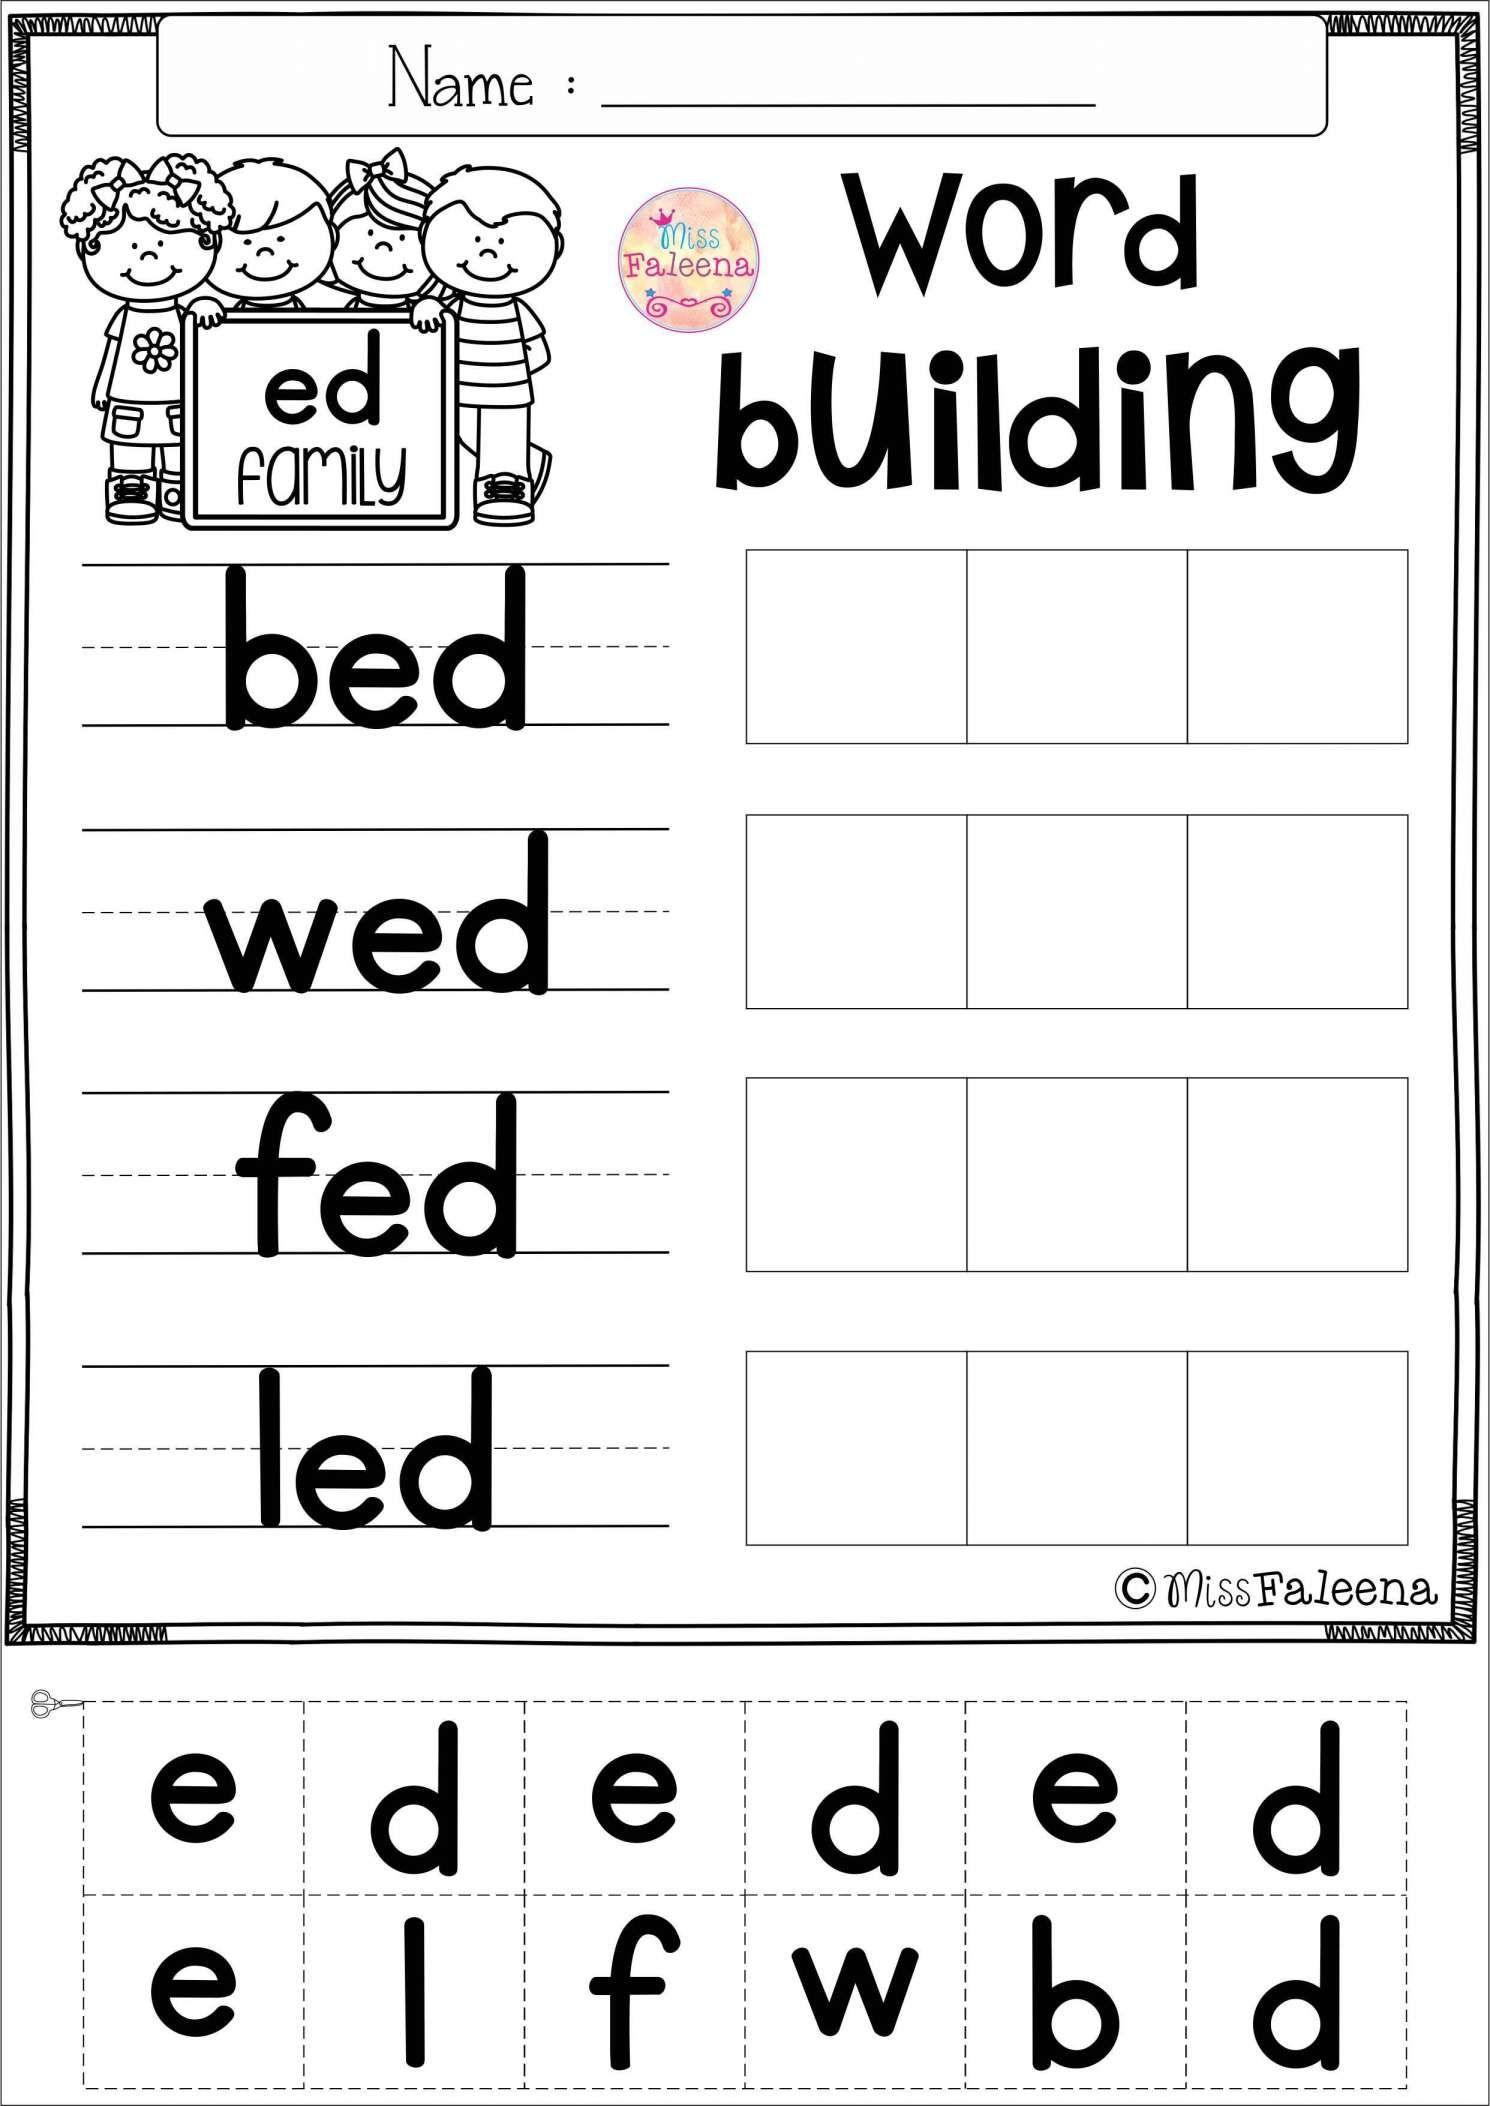 Preschool Worksheet With Short Words And Free Cvc Word Exercise Short E Cvc Words Words Help Teaching Cvc Words Writing Cvc Words Cvc Worksheets [ 2106 x 1490 Pixel ]